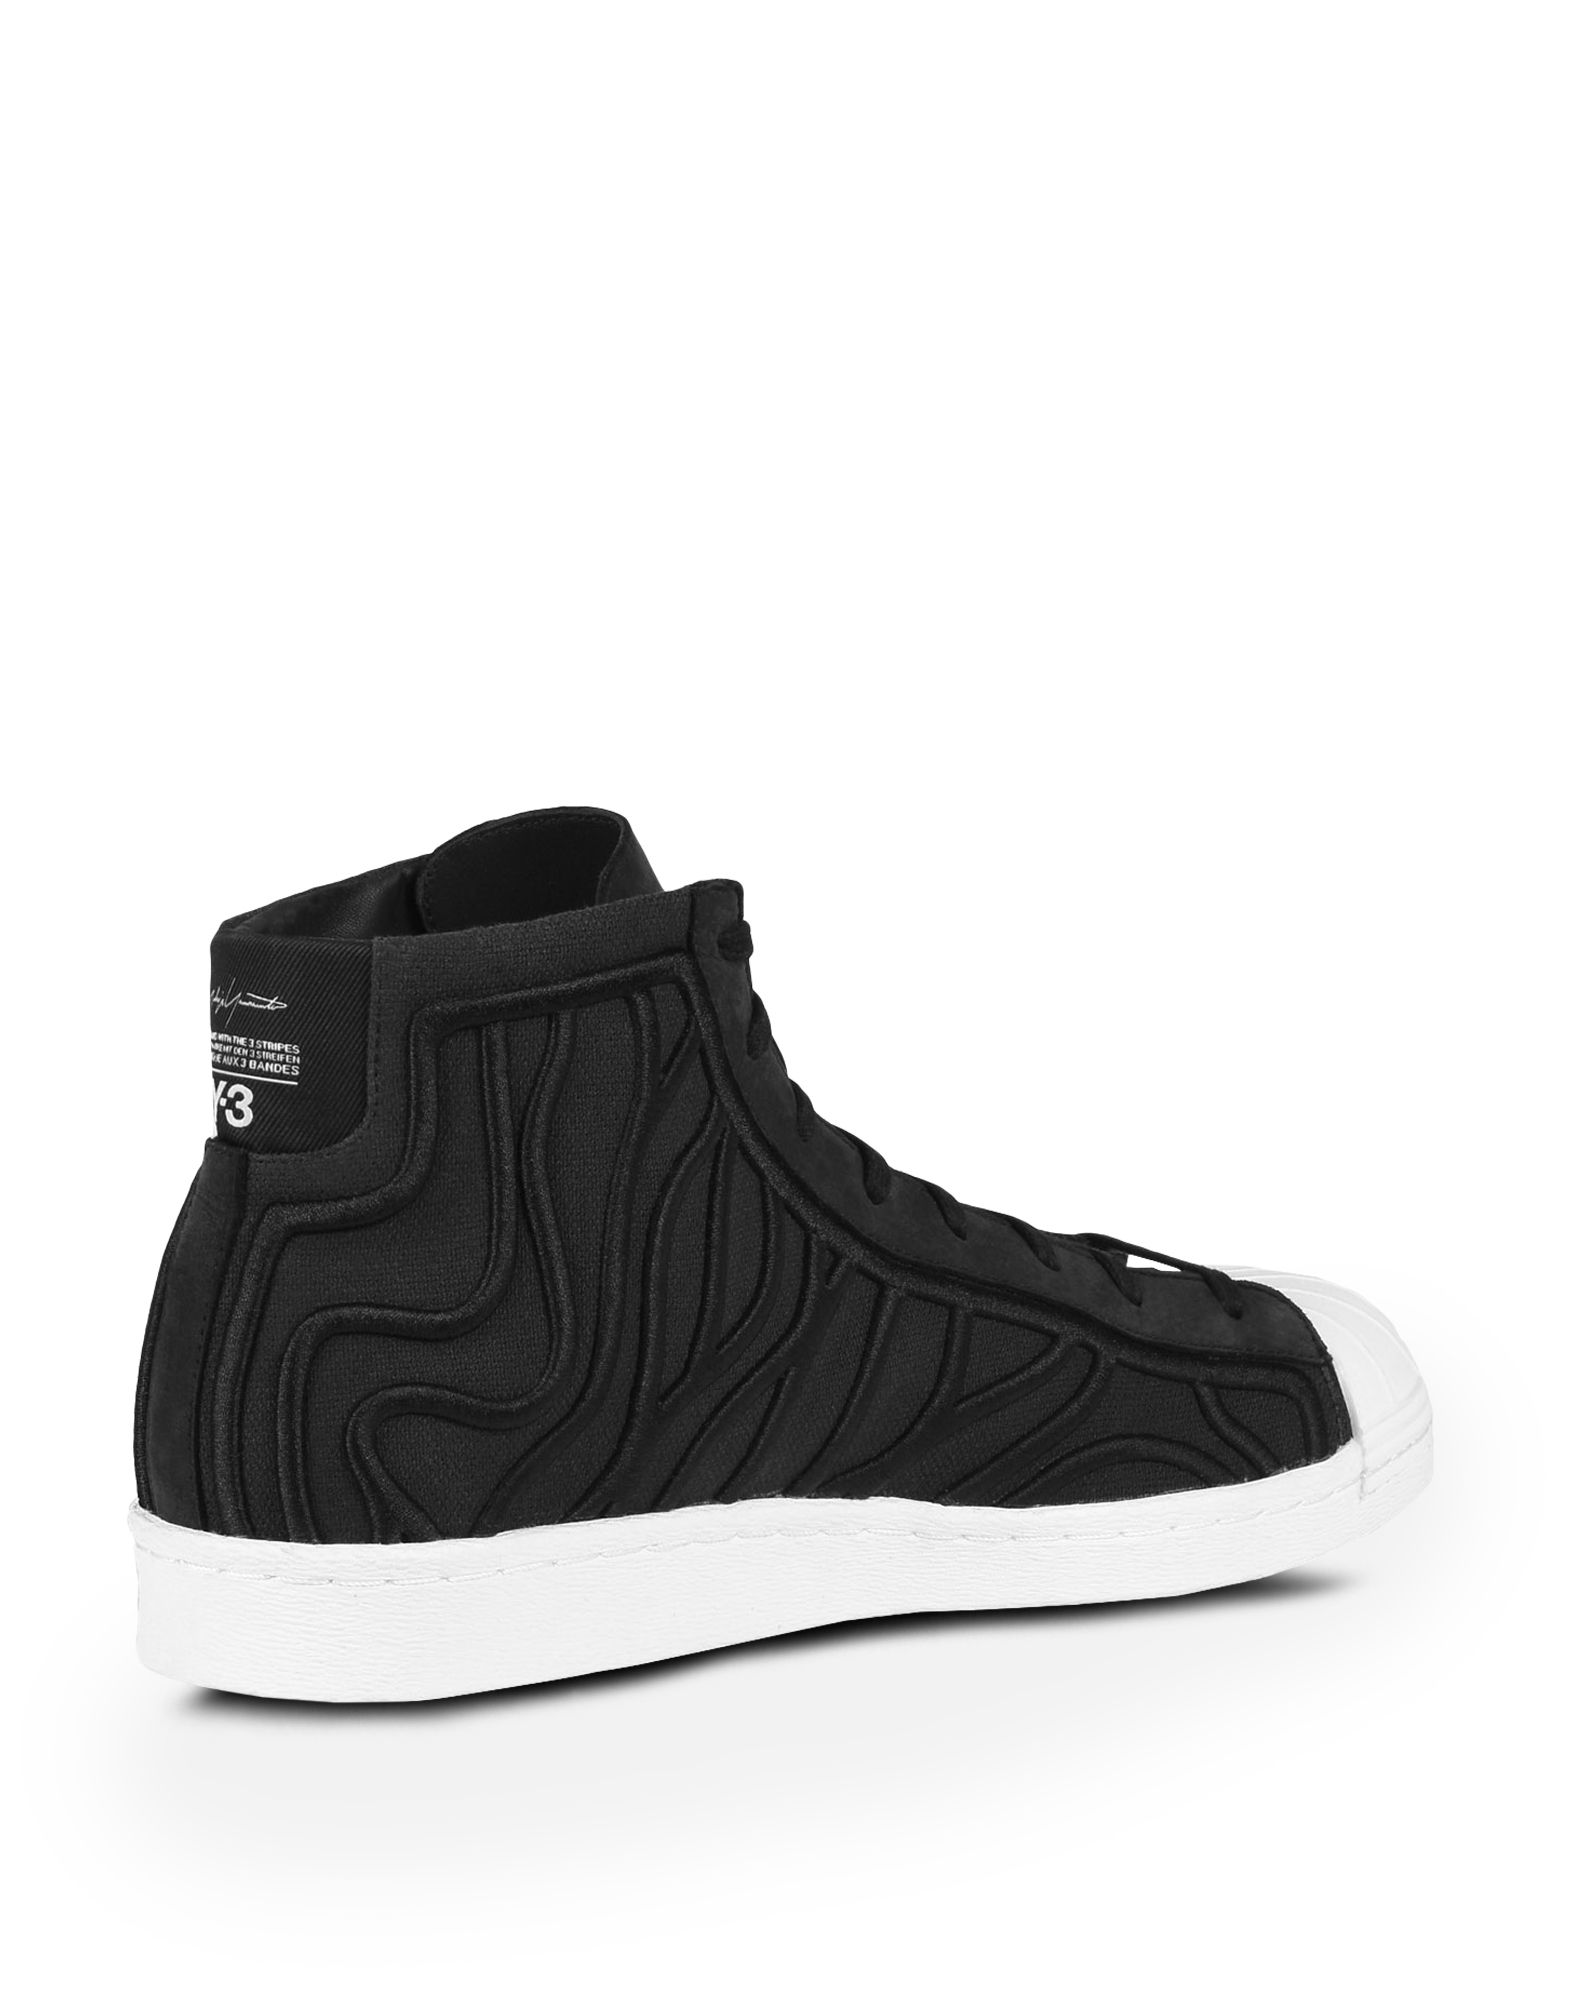 Y-3 Y-3 SHISHU SUPER High-top sneakers E d